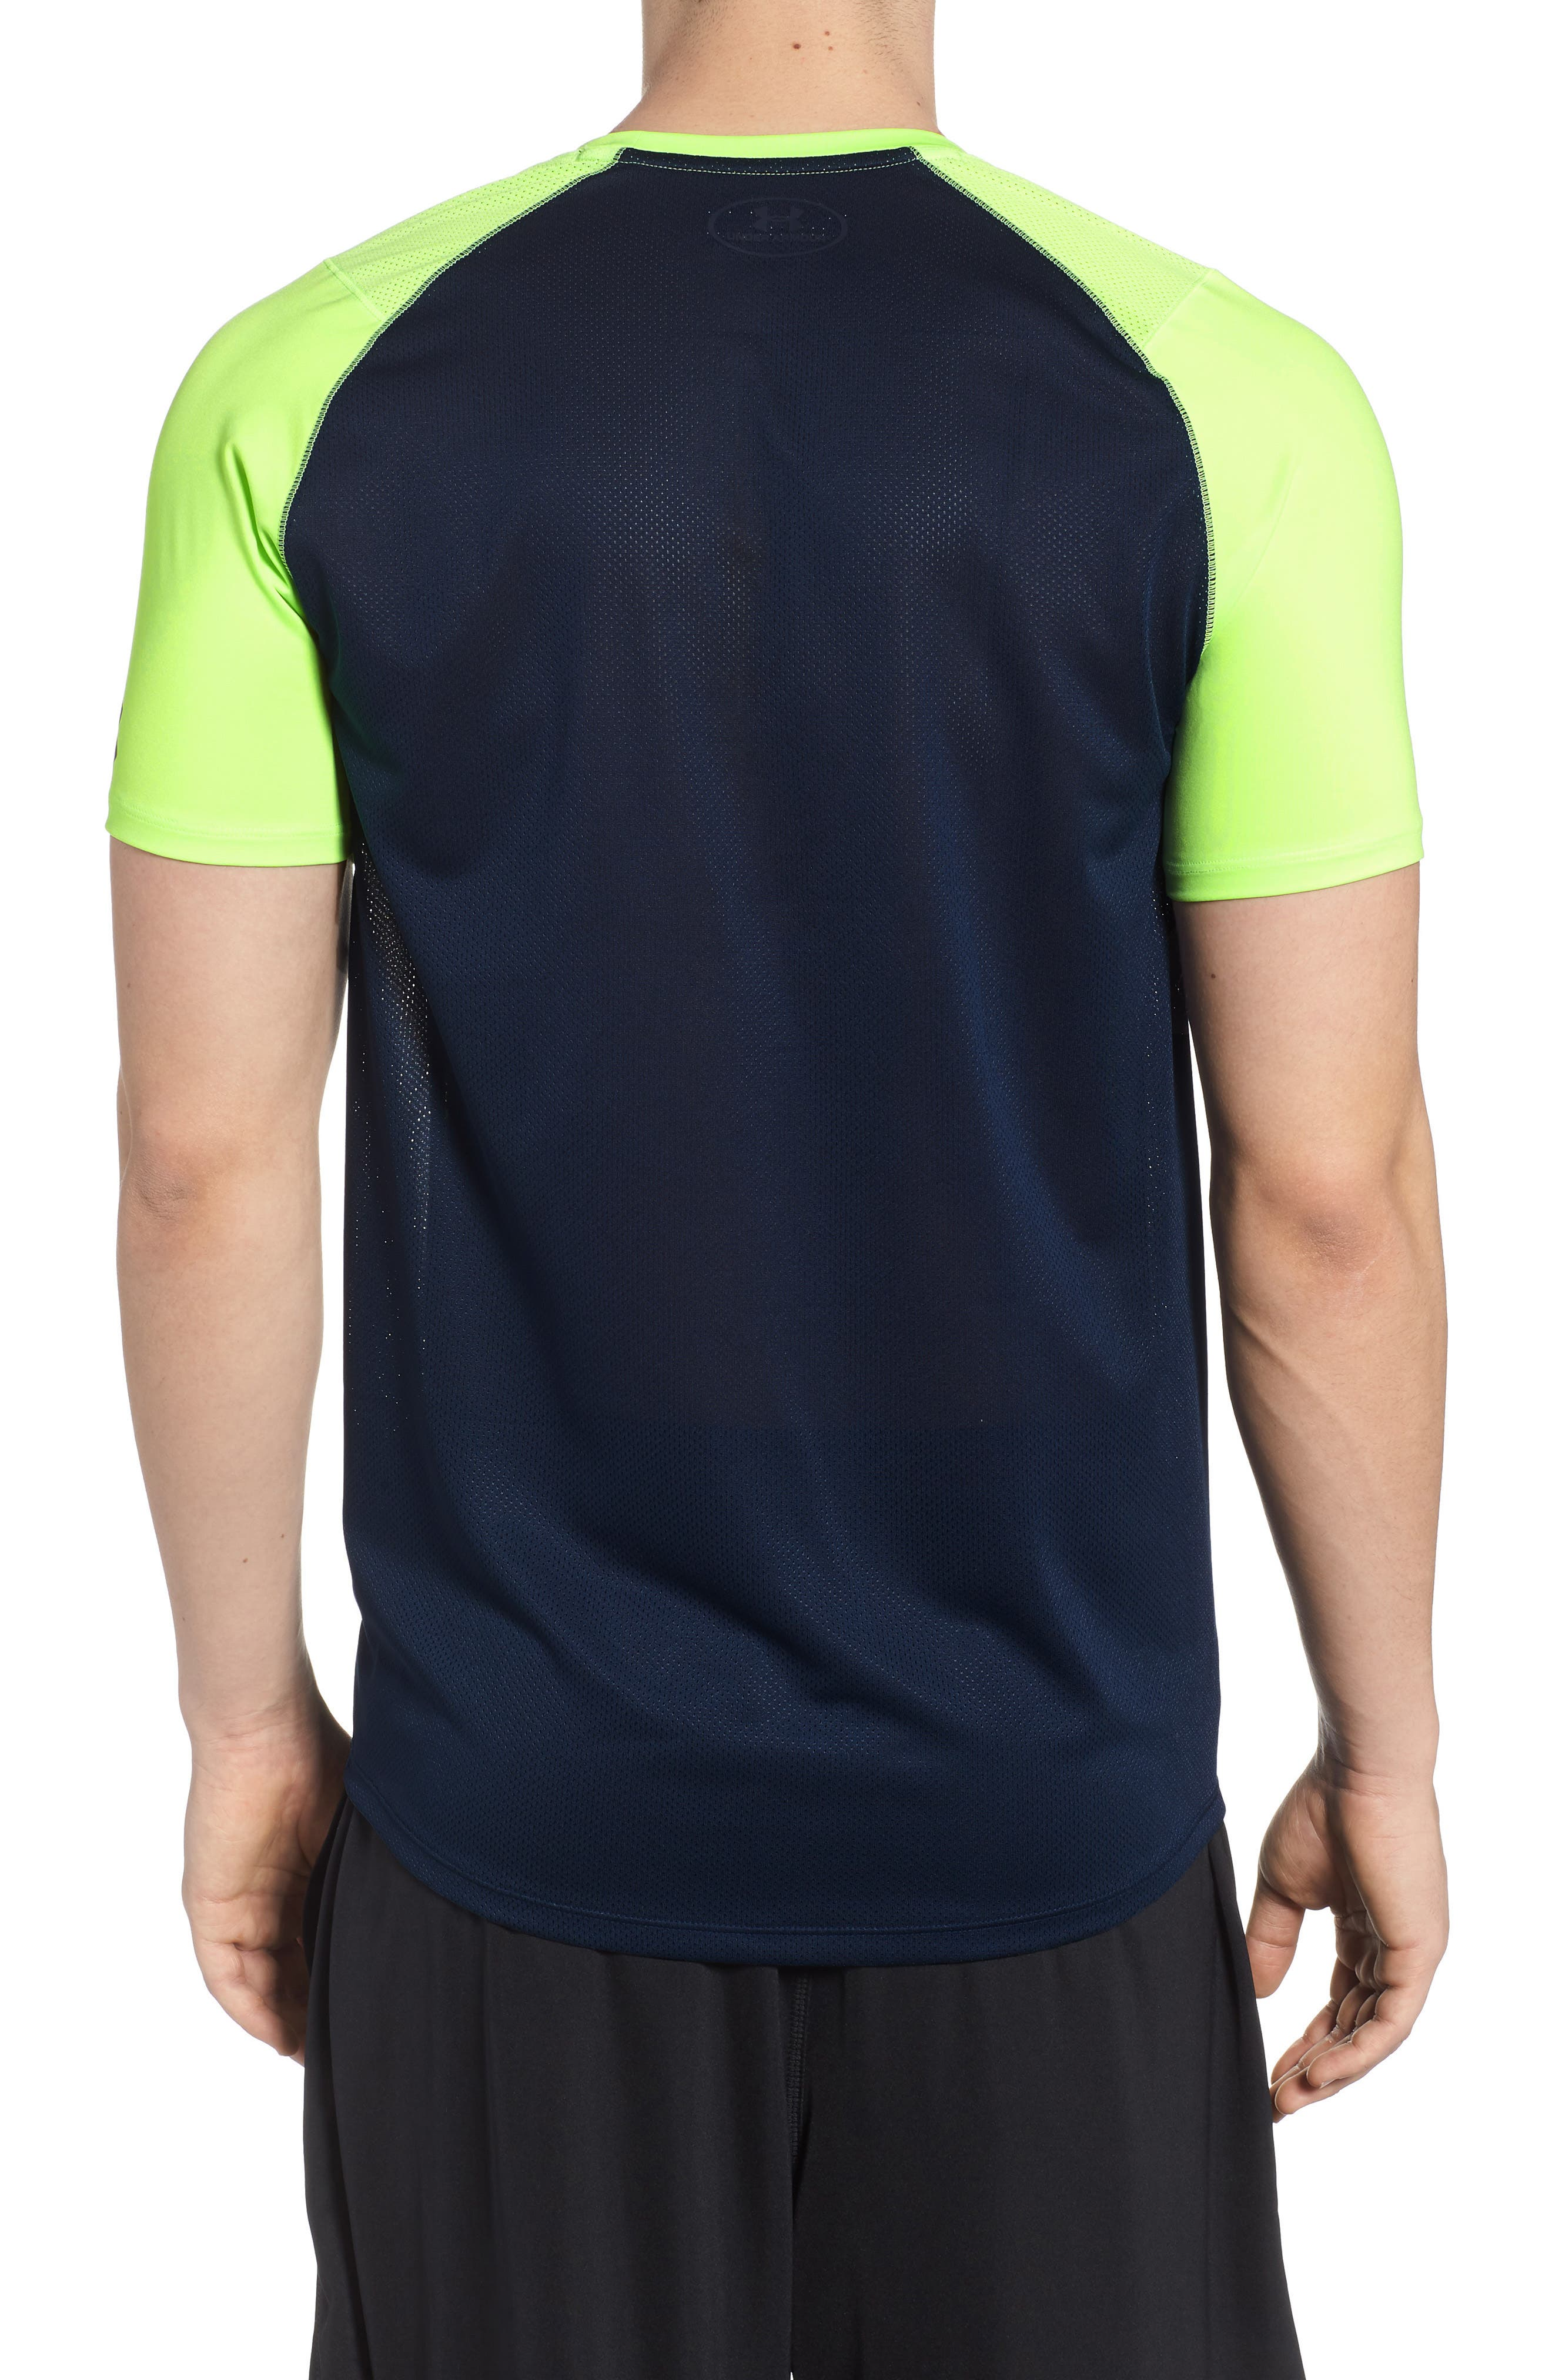 MK1 Dash Crewneck T-Shirt,                             Alternate thumbnail 2, color,                             Lime / Academy / Graphite